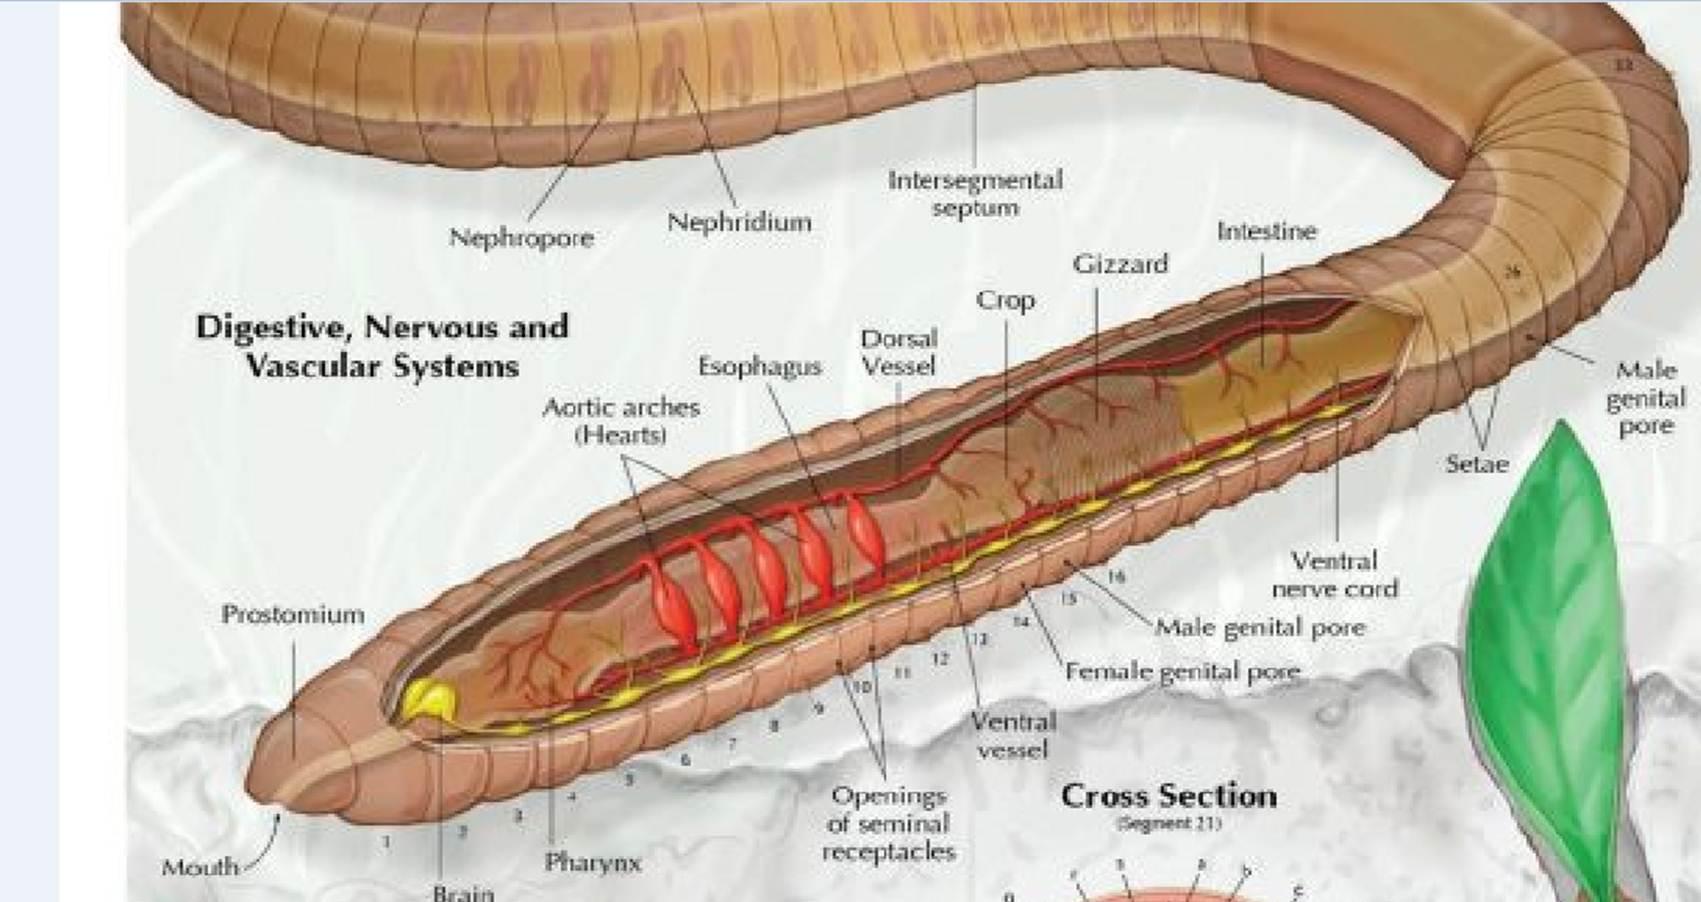 Worksheets Earthworm Anatomy Worksheet biotexan earthworm chart diagram